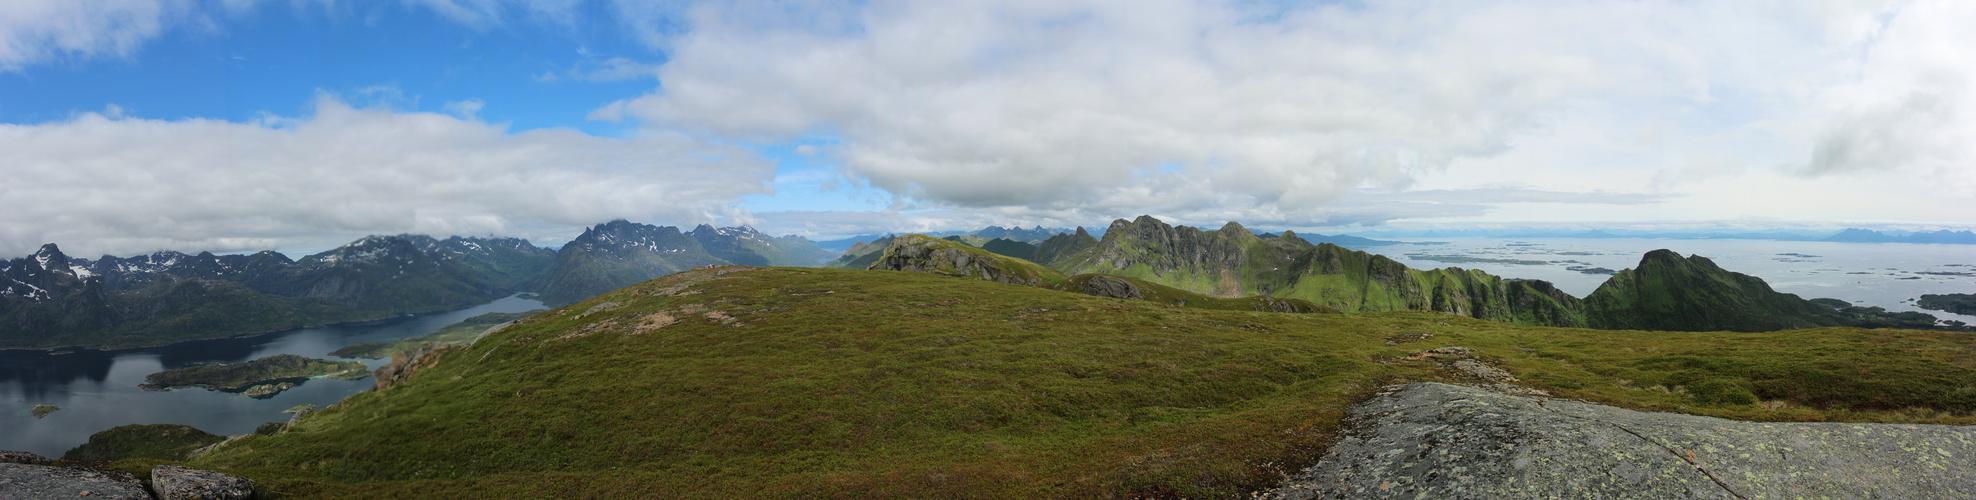 Panorama Berglandschaft 2